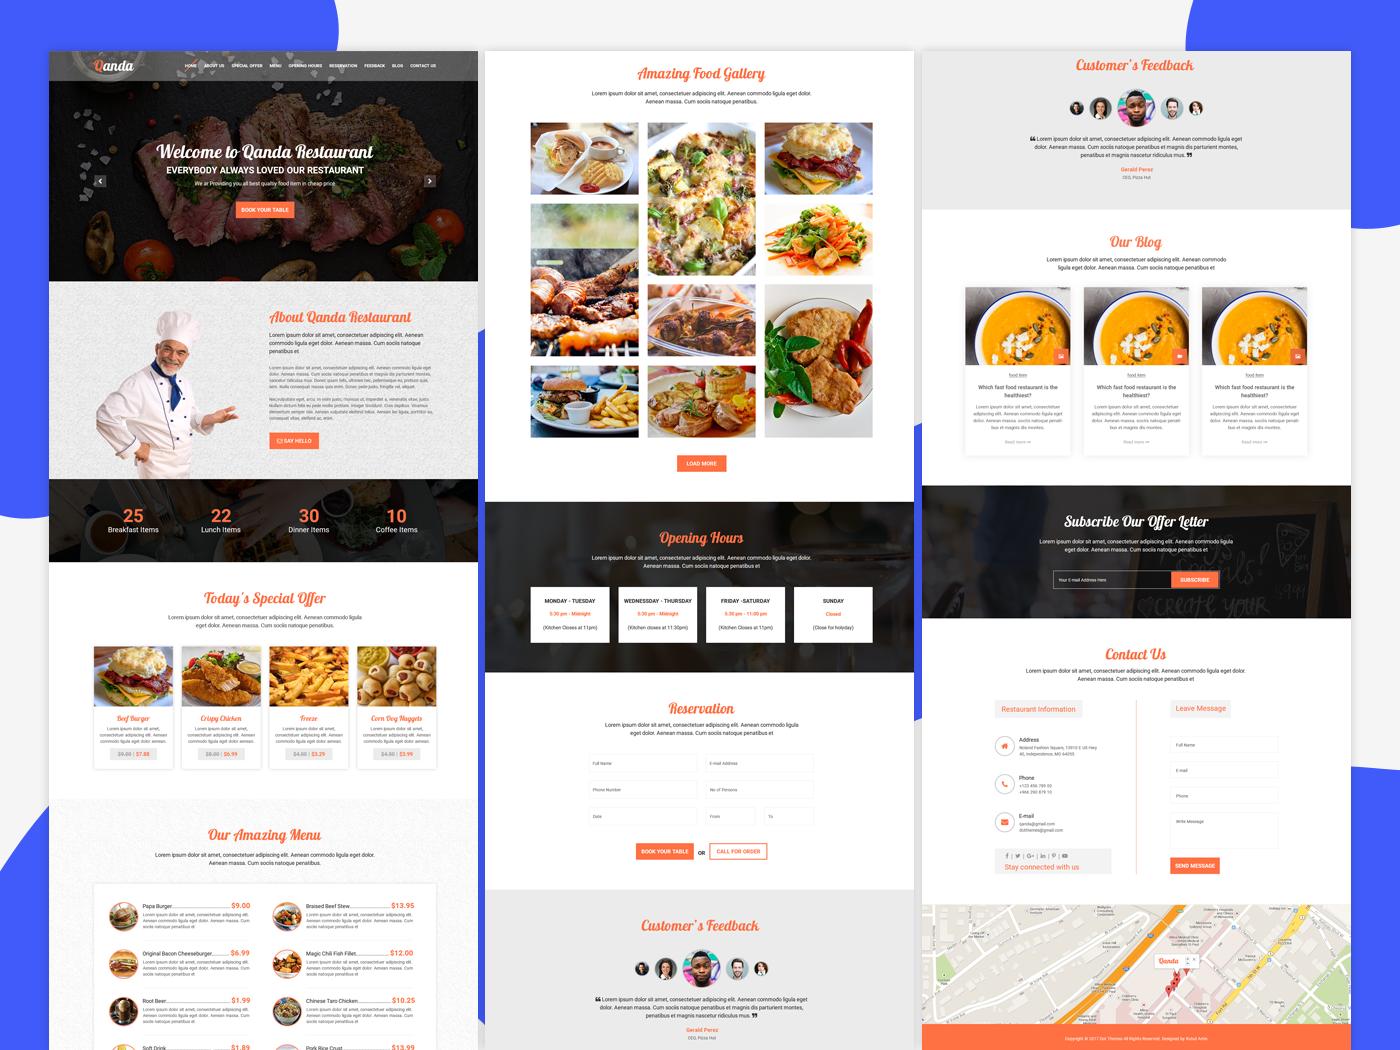 Quanda - Pizza shop restaurant website template by